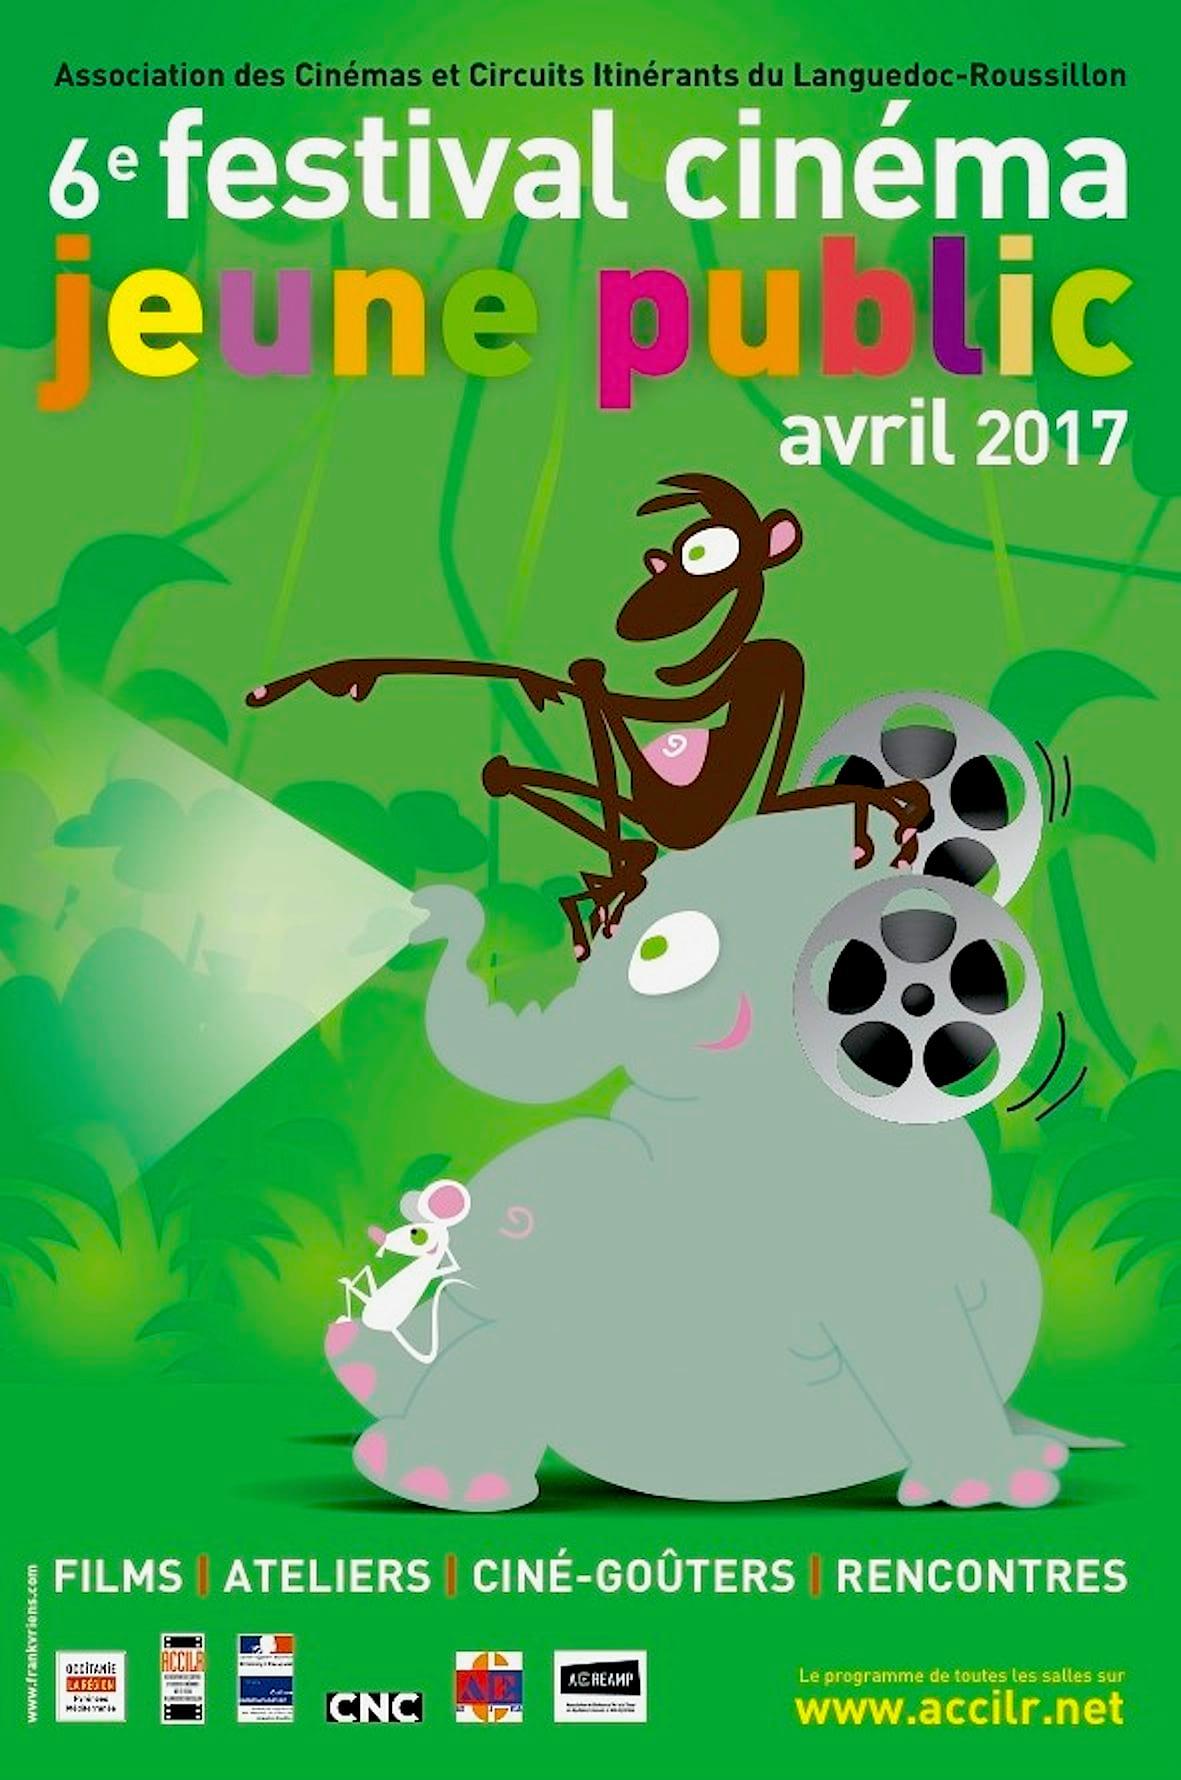 Youth cinema festival in Argelès